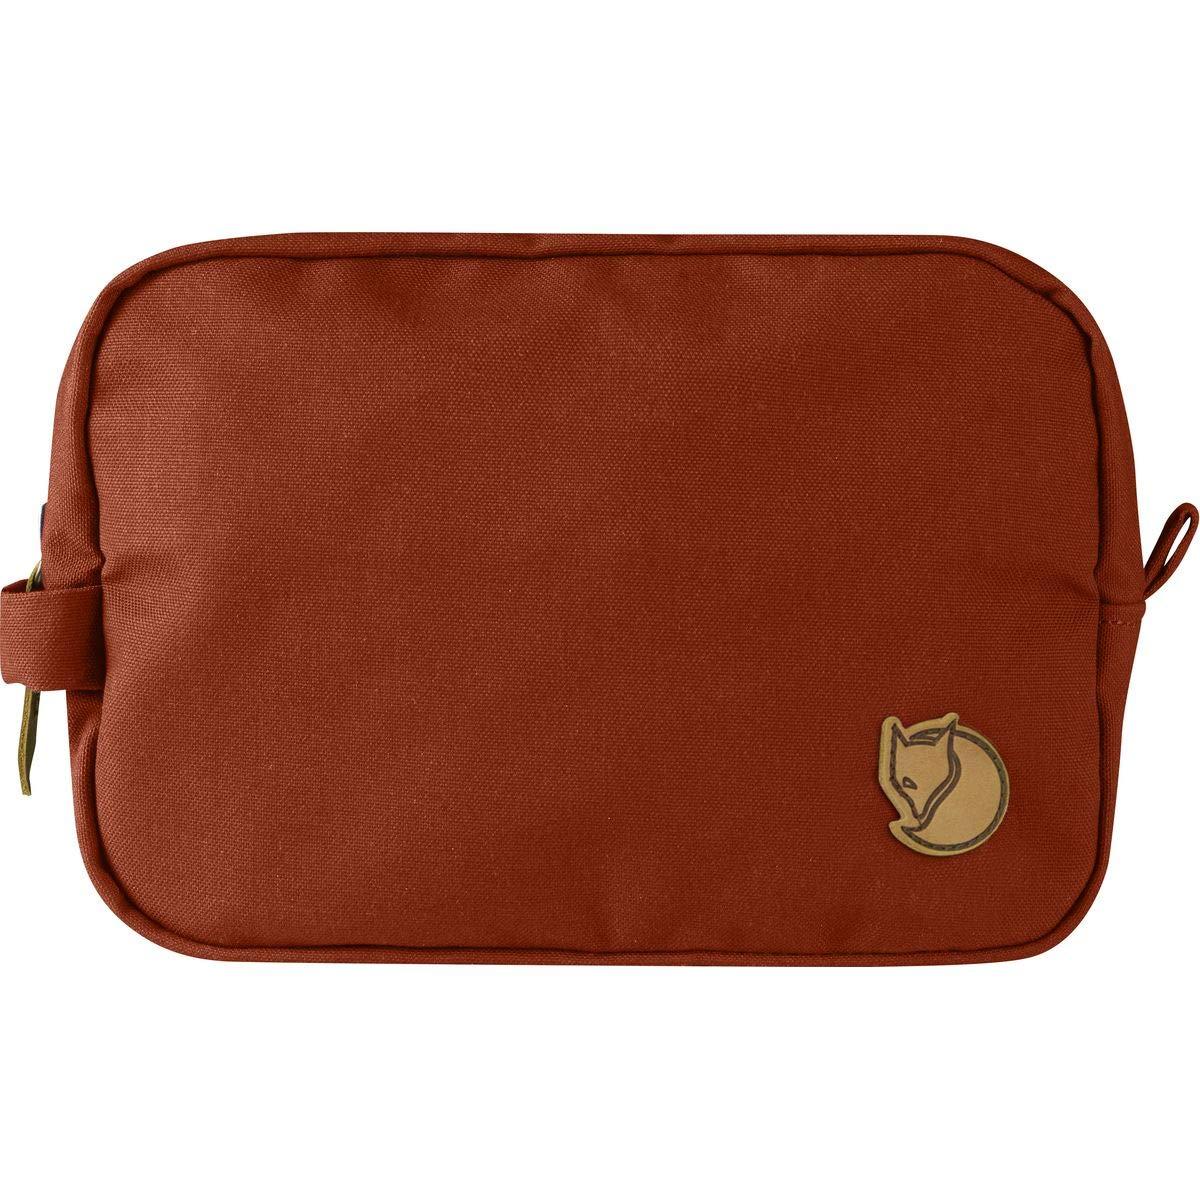 Fjallraven Gear Bag 2L Organizer Autumn Leaf, One Size by Fjallraven